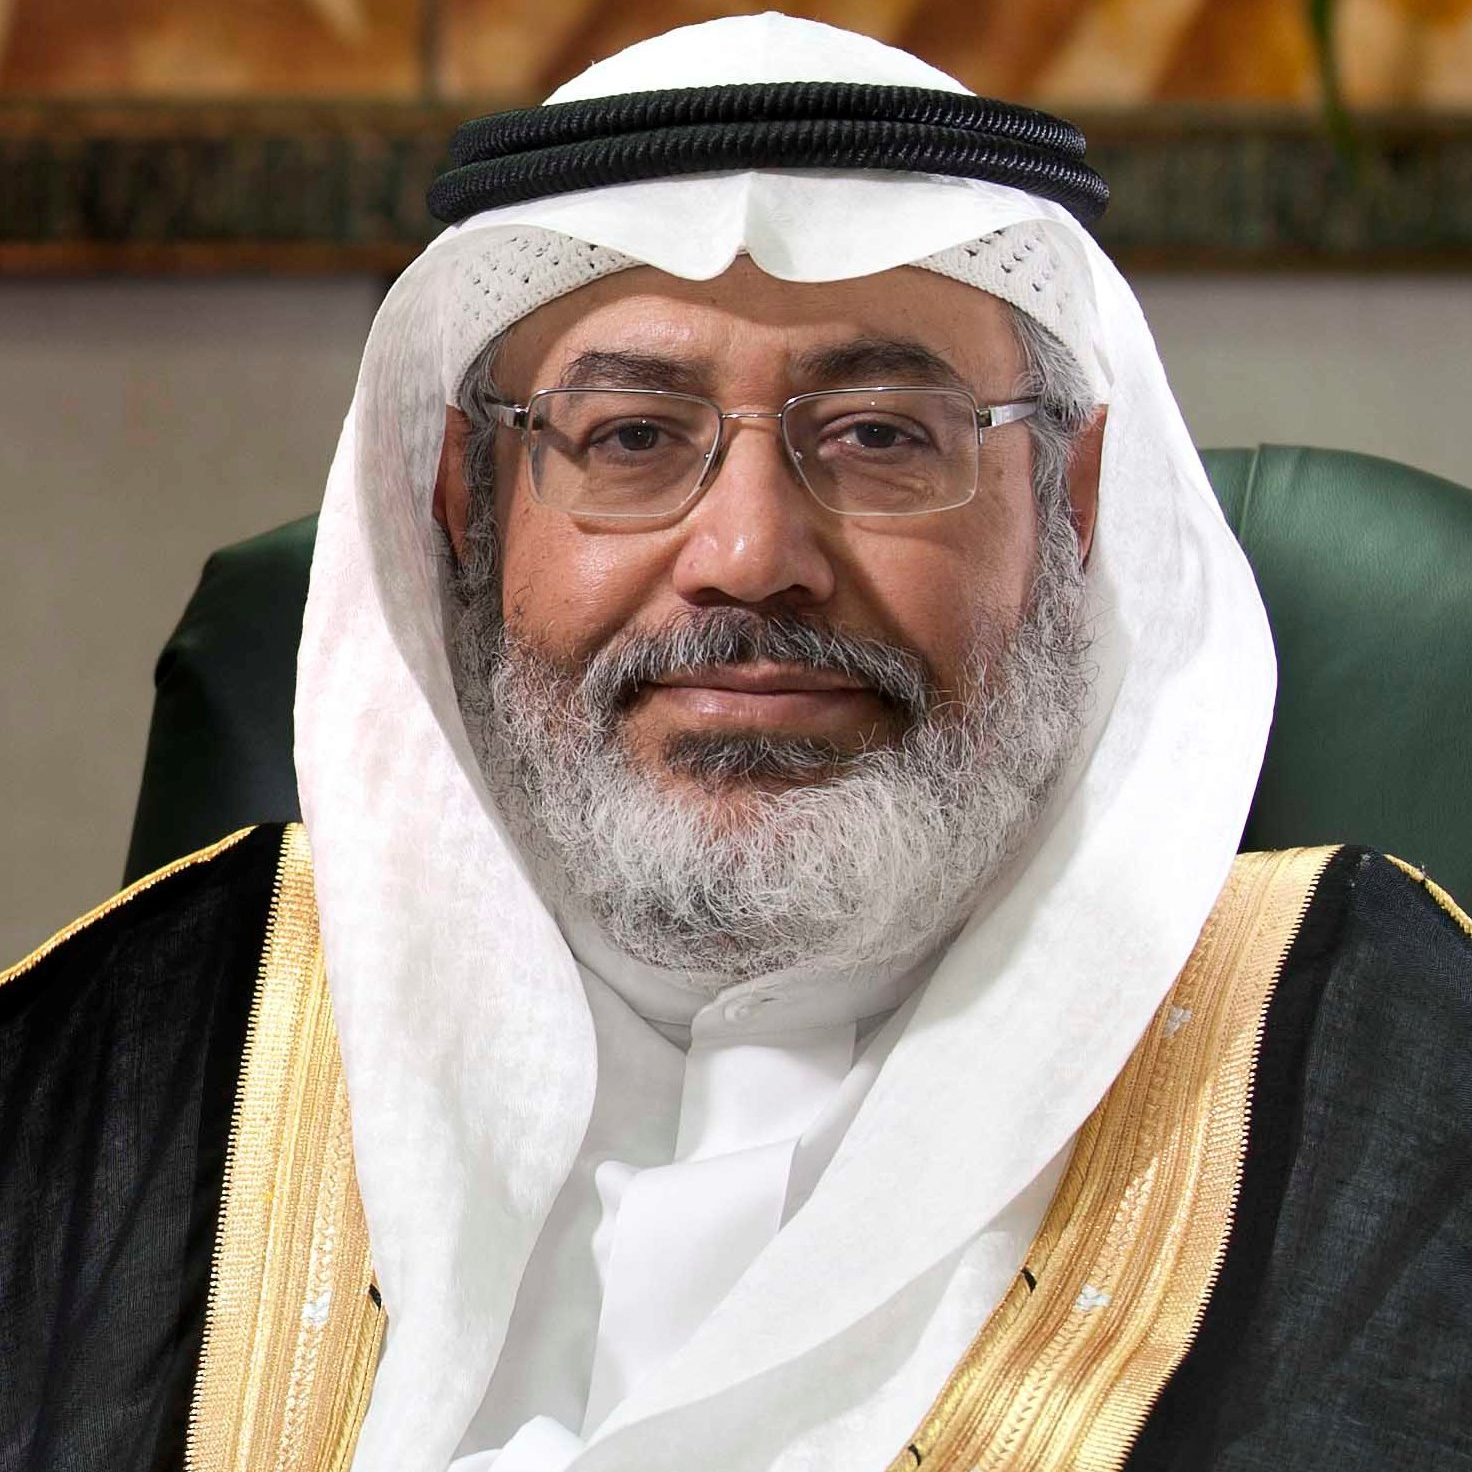 Dr. Moayyed Al-Qurtas